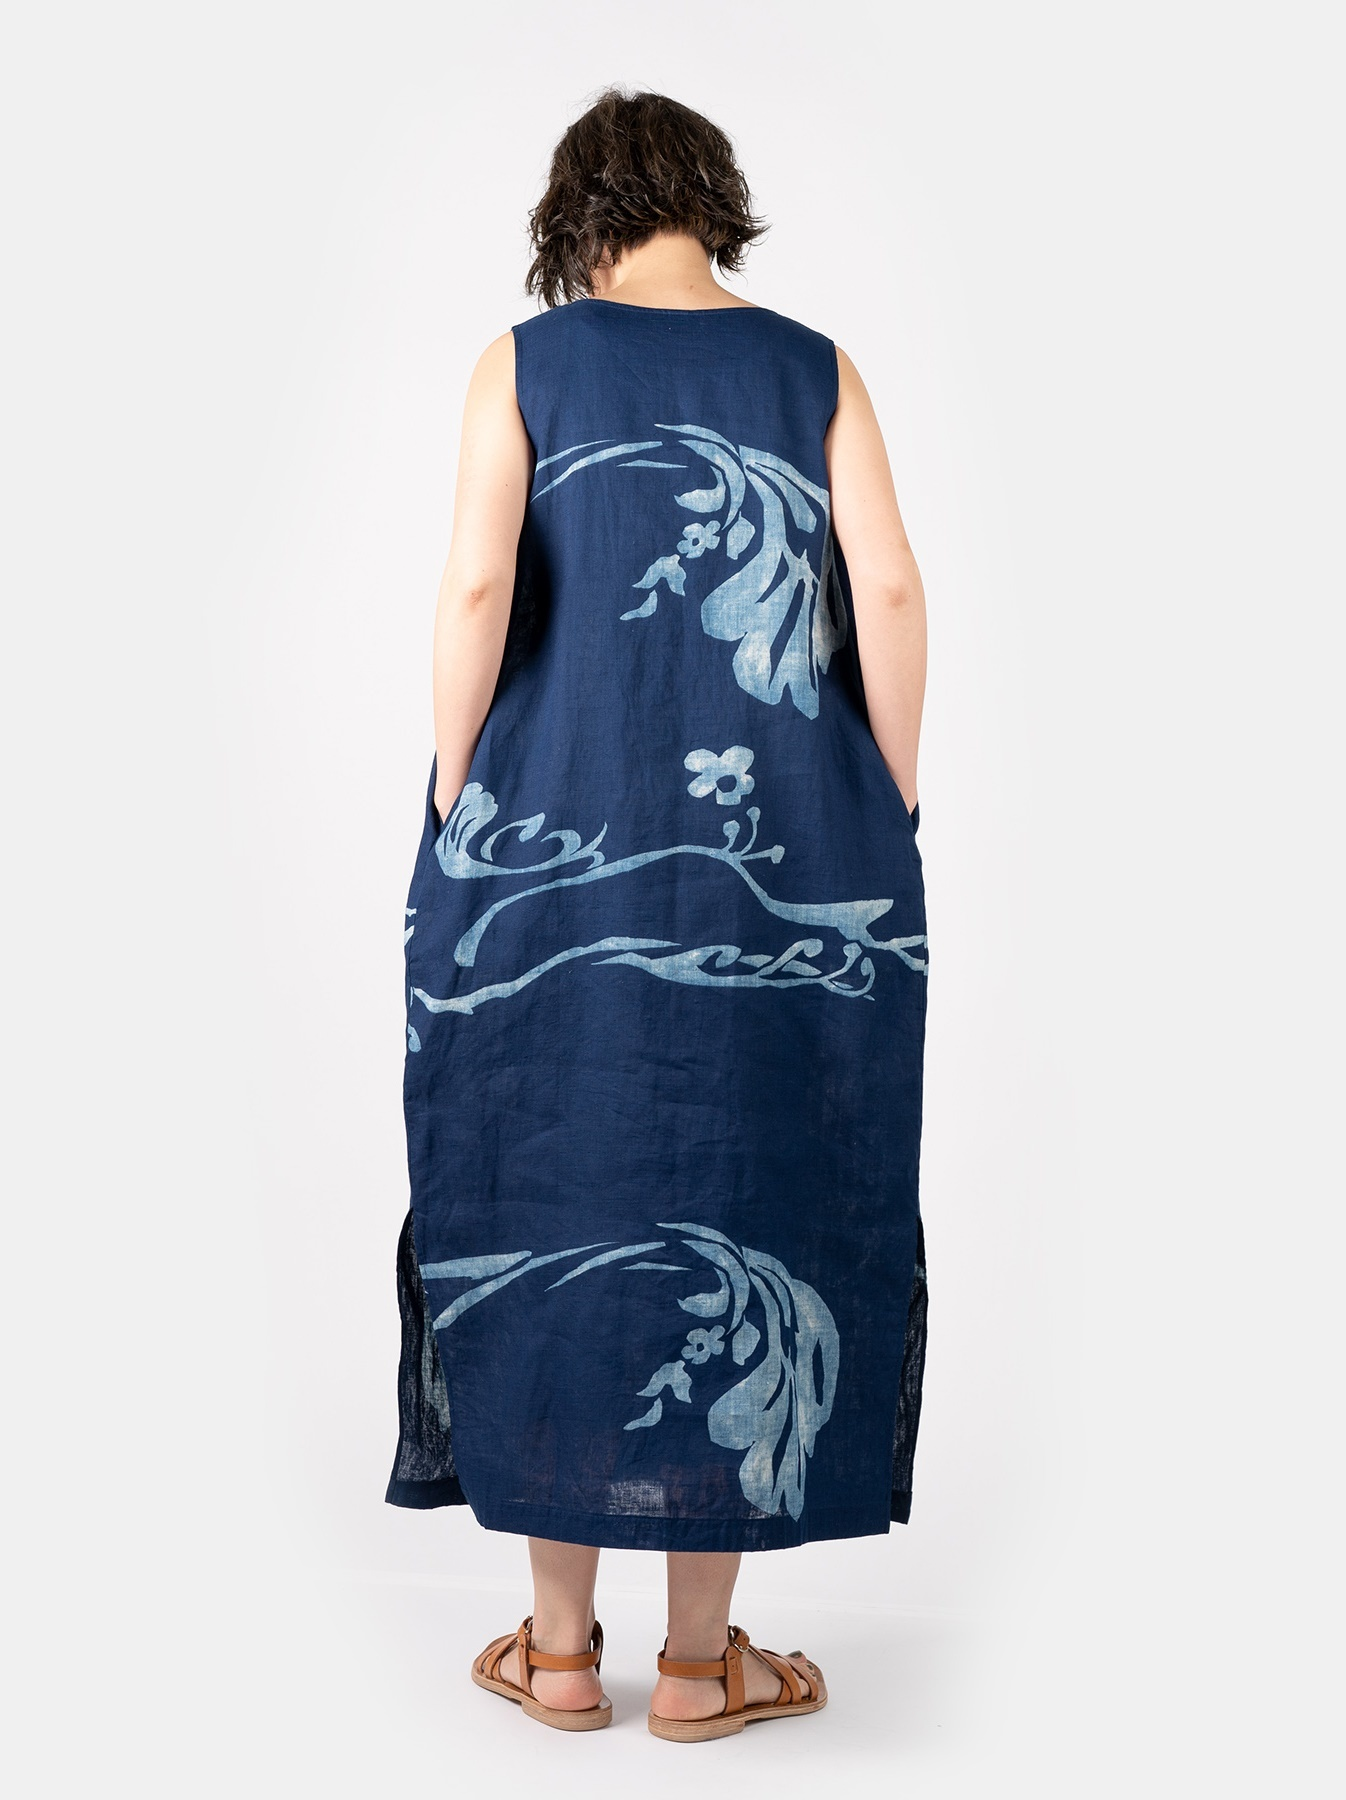 WH Indigo W-cloth Umiiloha Dress-4